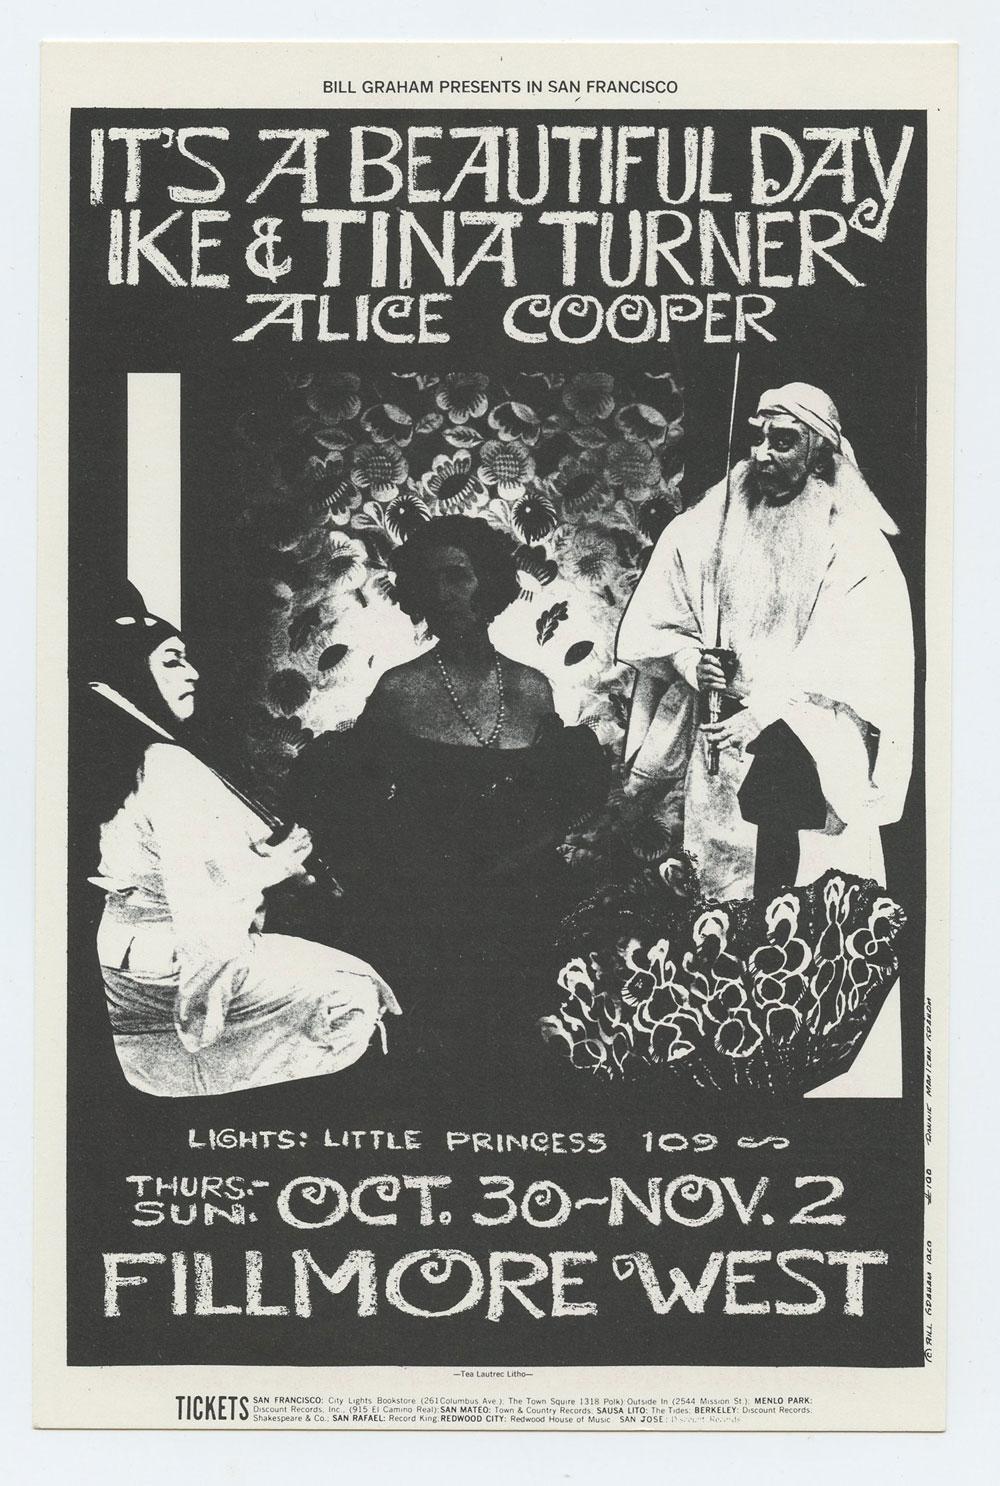 Bill Graham 198 Postcard Ad Back Tina Turner Alice Cooper 1969 Oct 30